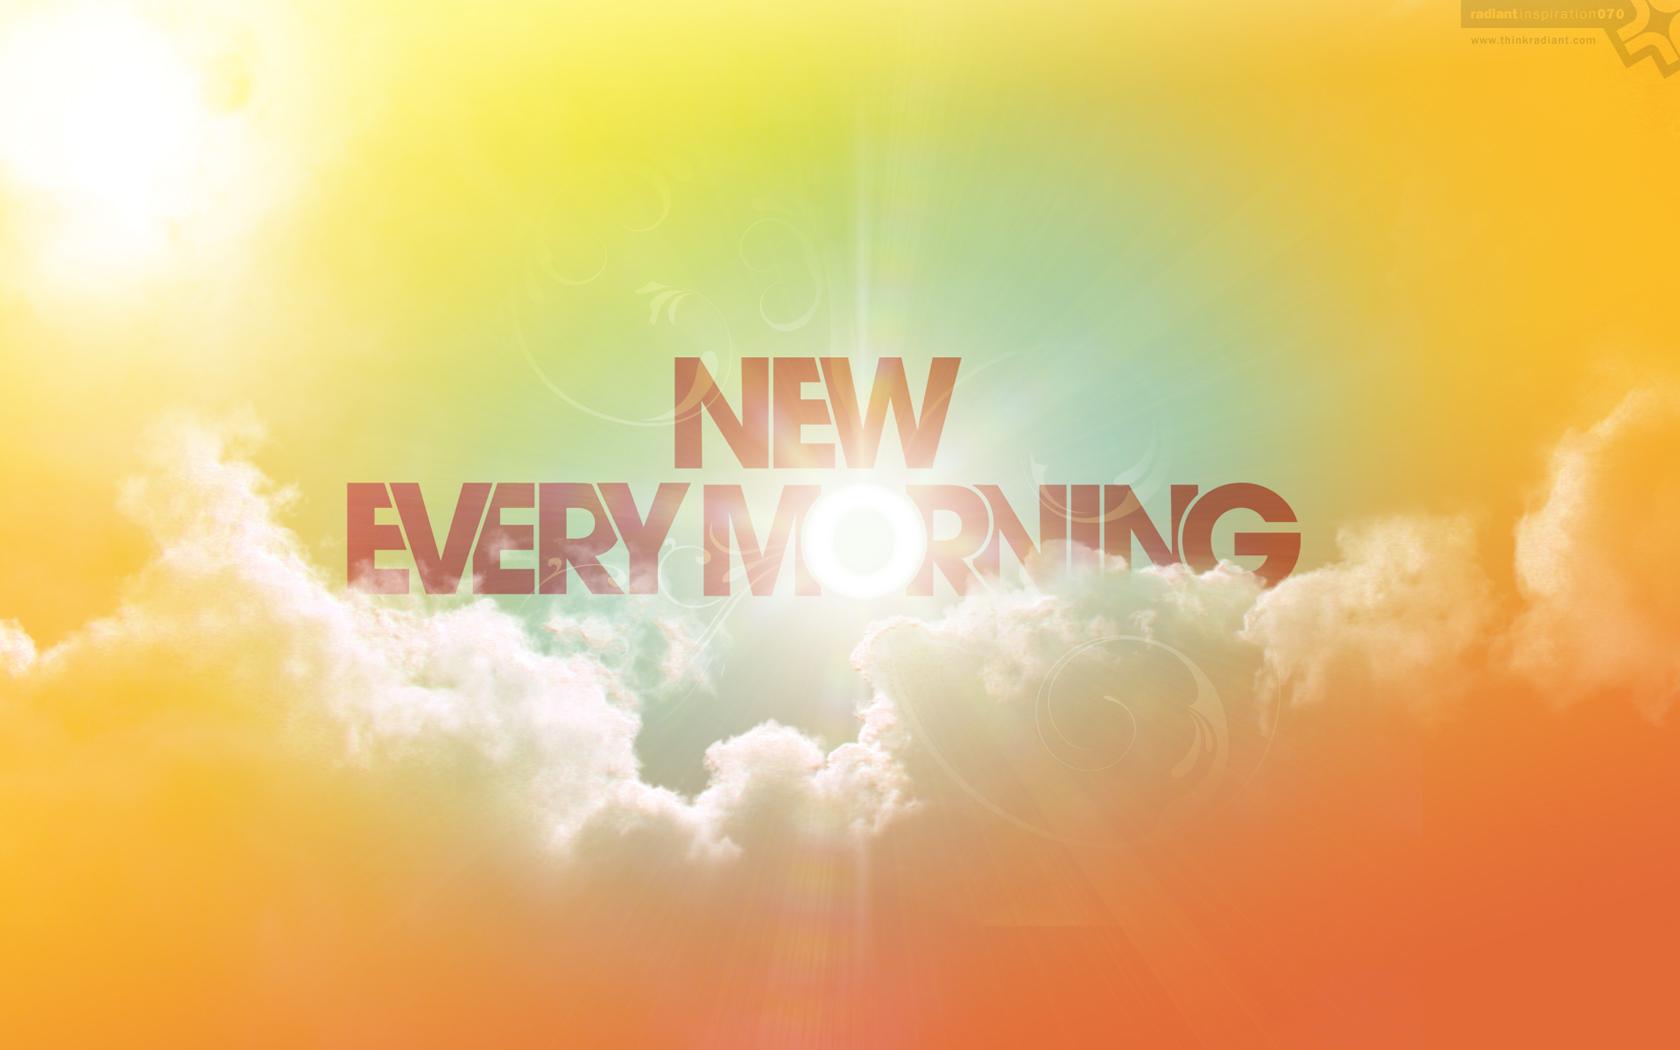 New Every Morning.jpg